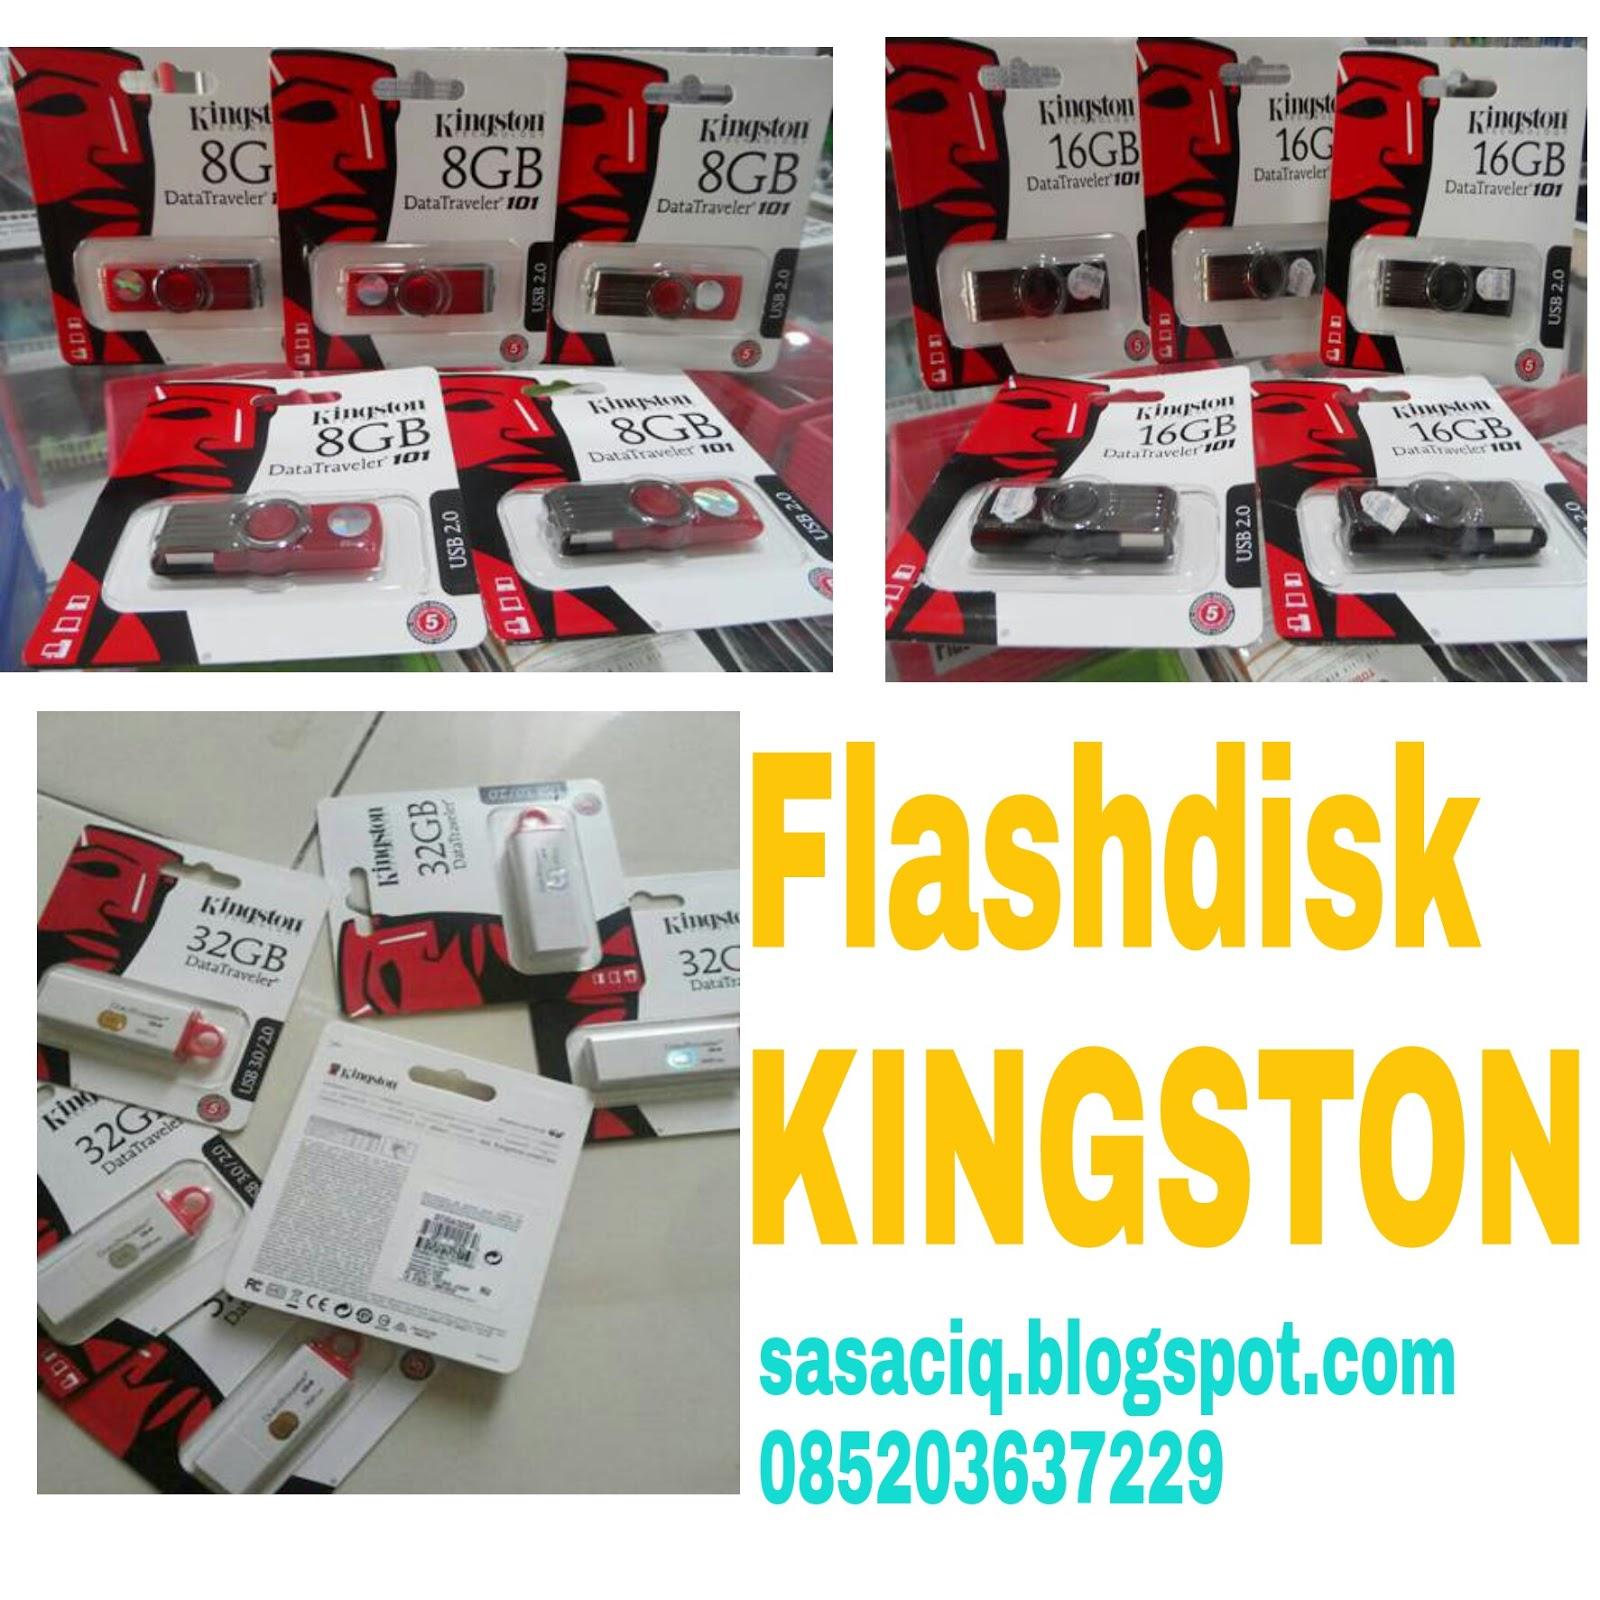 Flash Disk Murah Garansi Surabaya Pengen Nulis Aja Ter Flasdisk Toshiba 32 Gb Drive Kingston